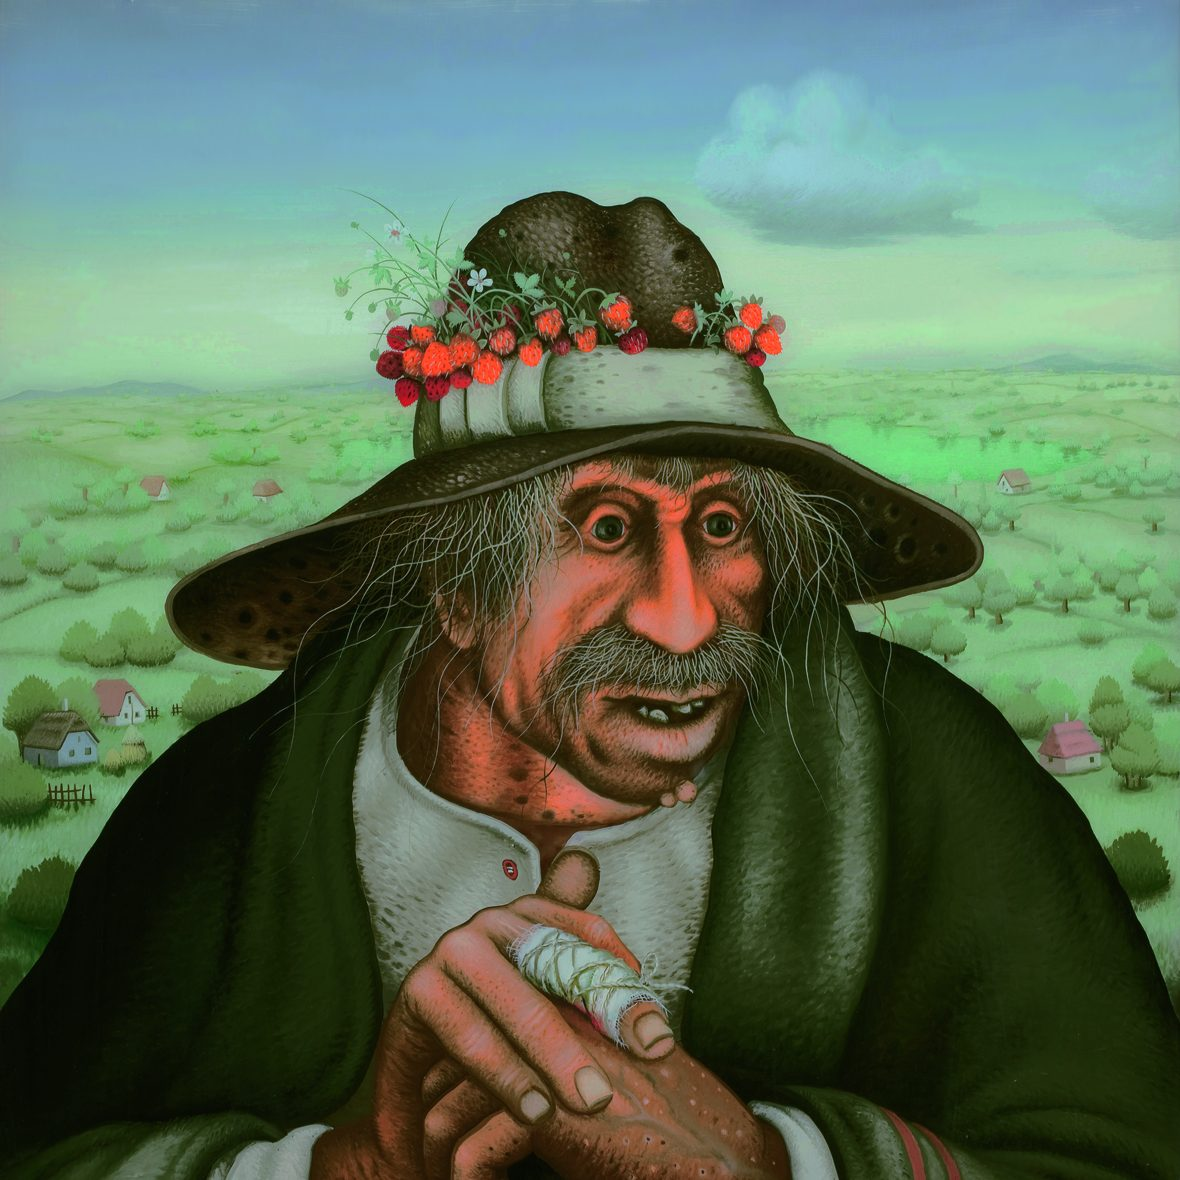 Marginal Characters in Rural Wonderlands: The Naïve Art of Mijo Kovačić